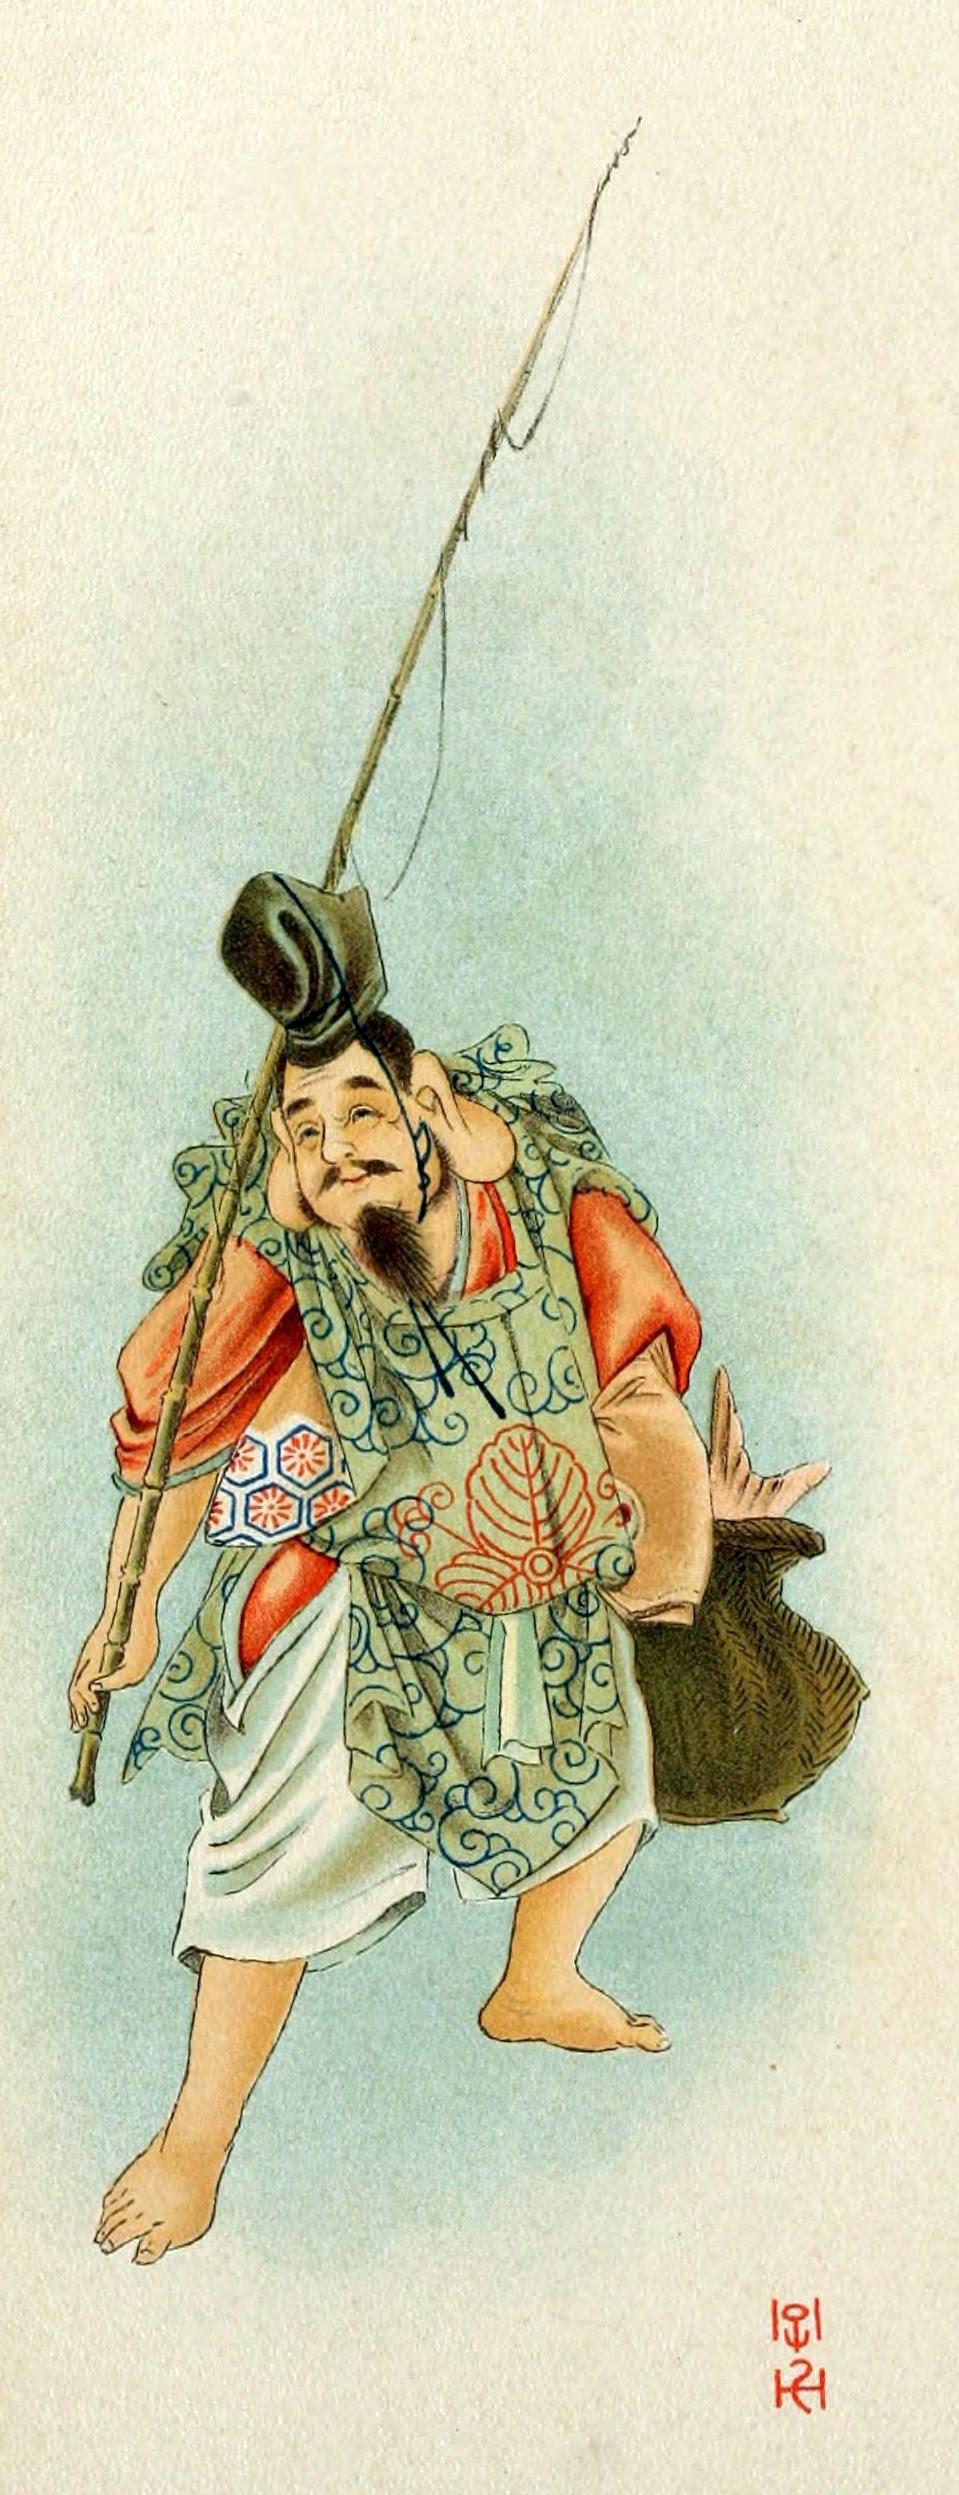 http://upload.wikimedia.org/wikipedia/commons/3/30/Ebisu_-_color.jpg